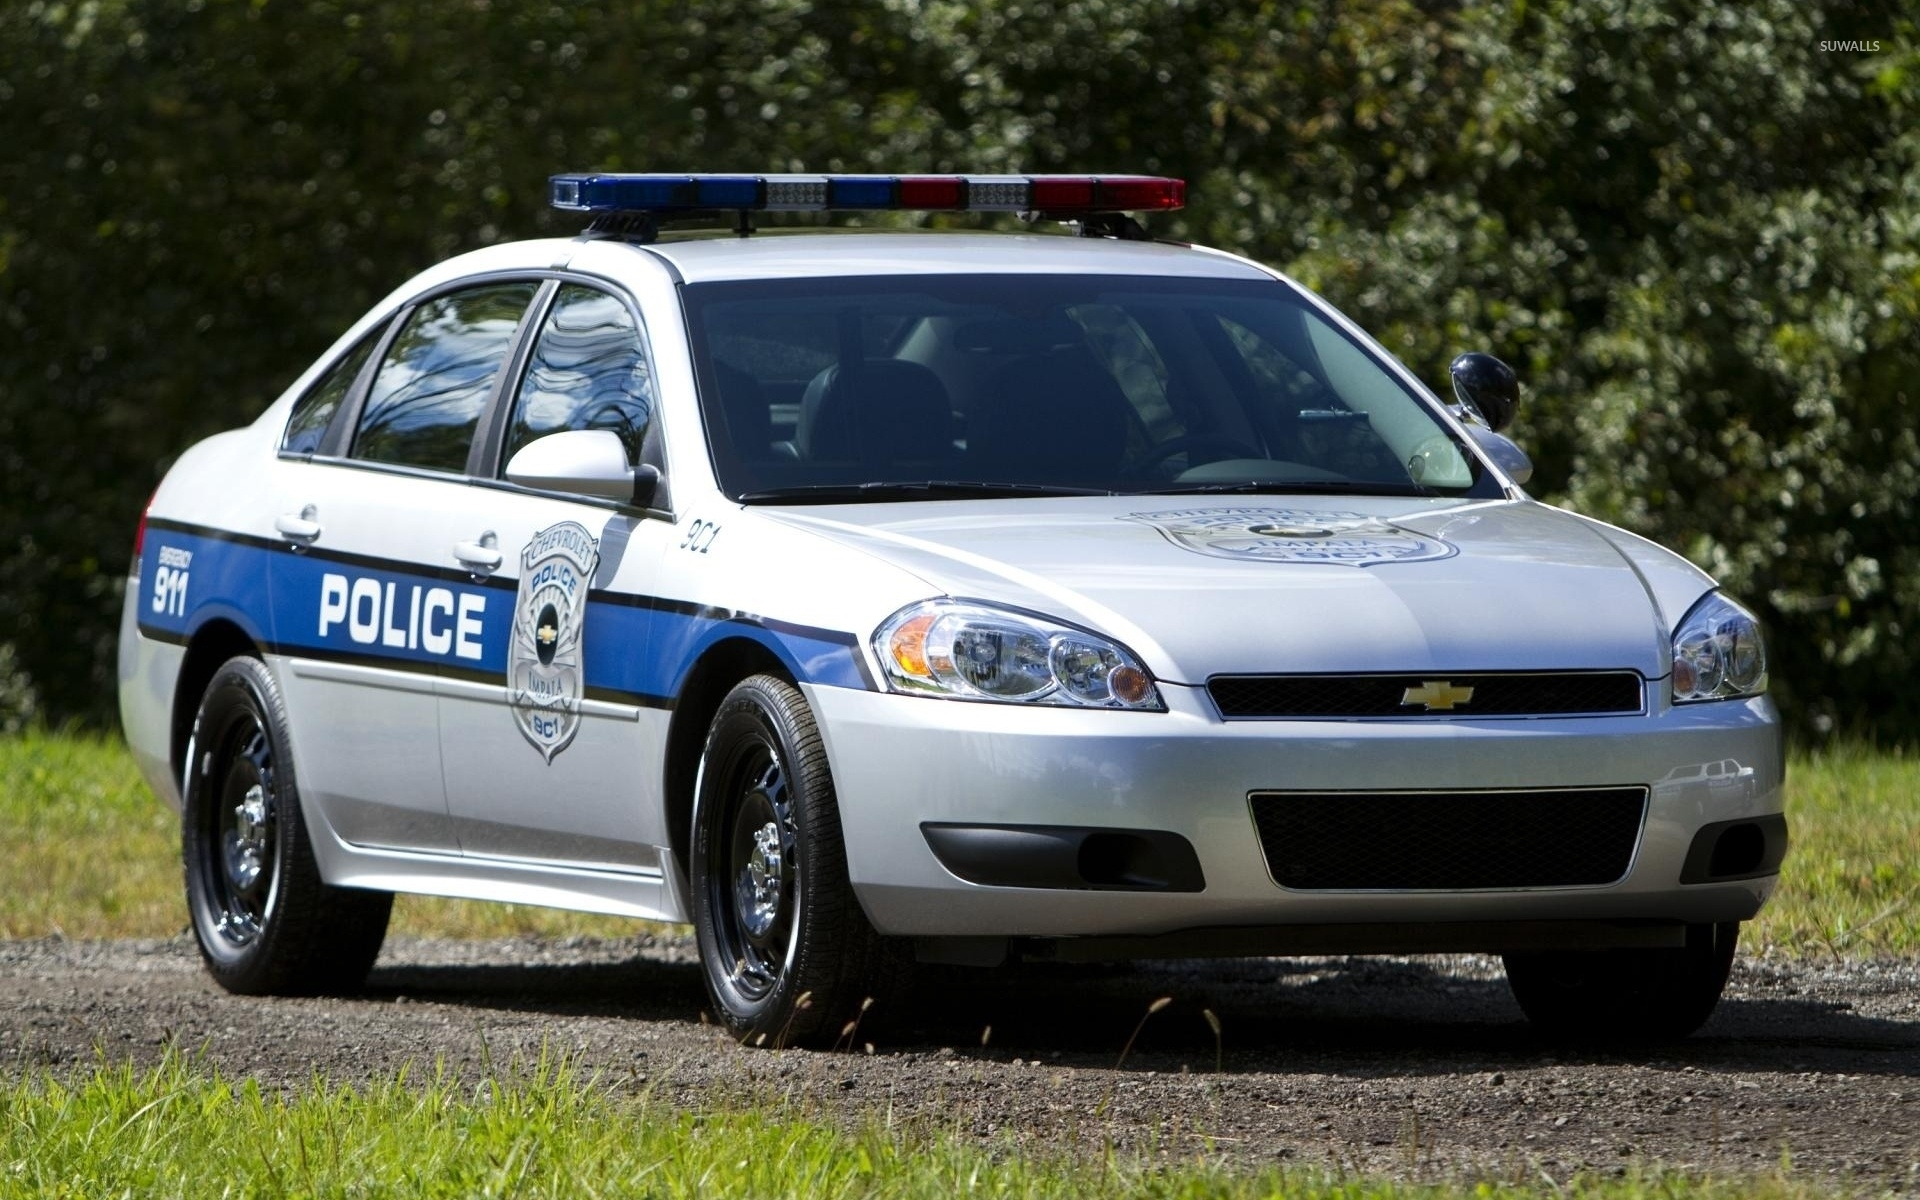 Chevrolet Impala Police Car Wallpaper Car Wallpapers